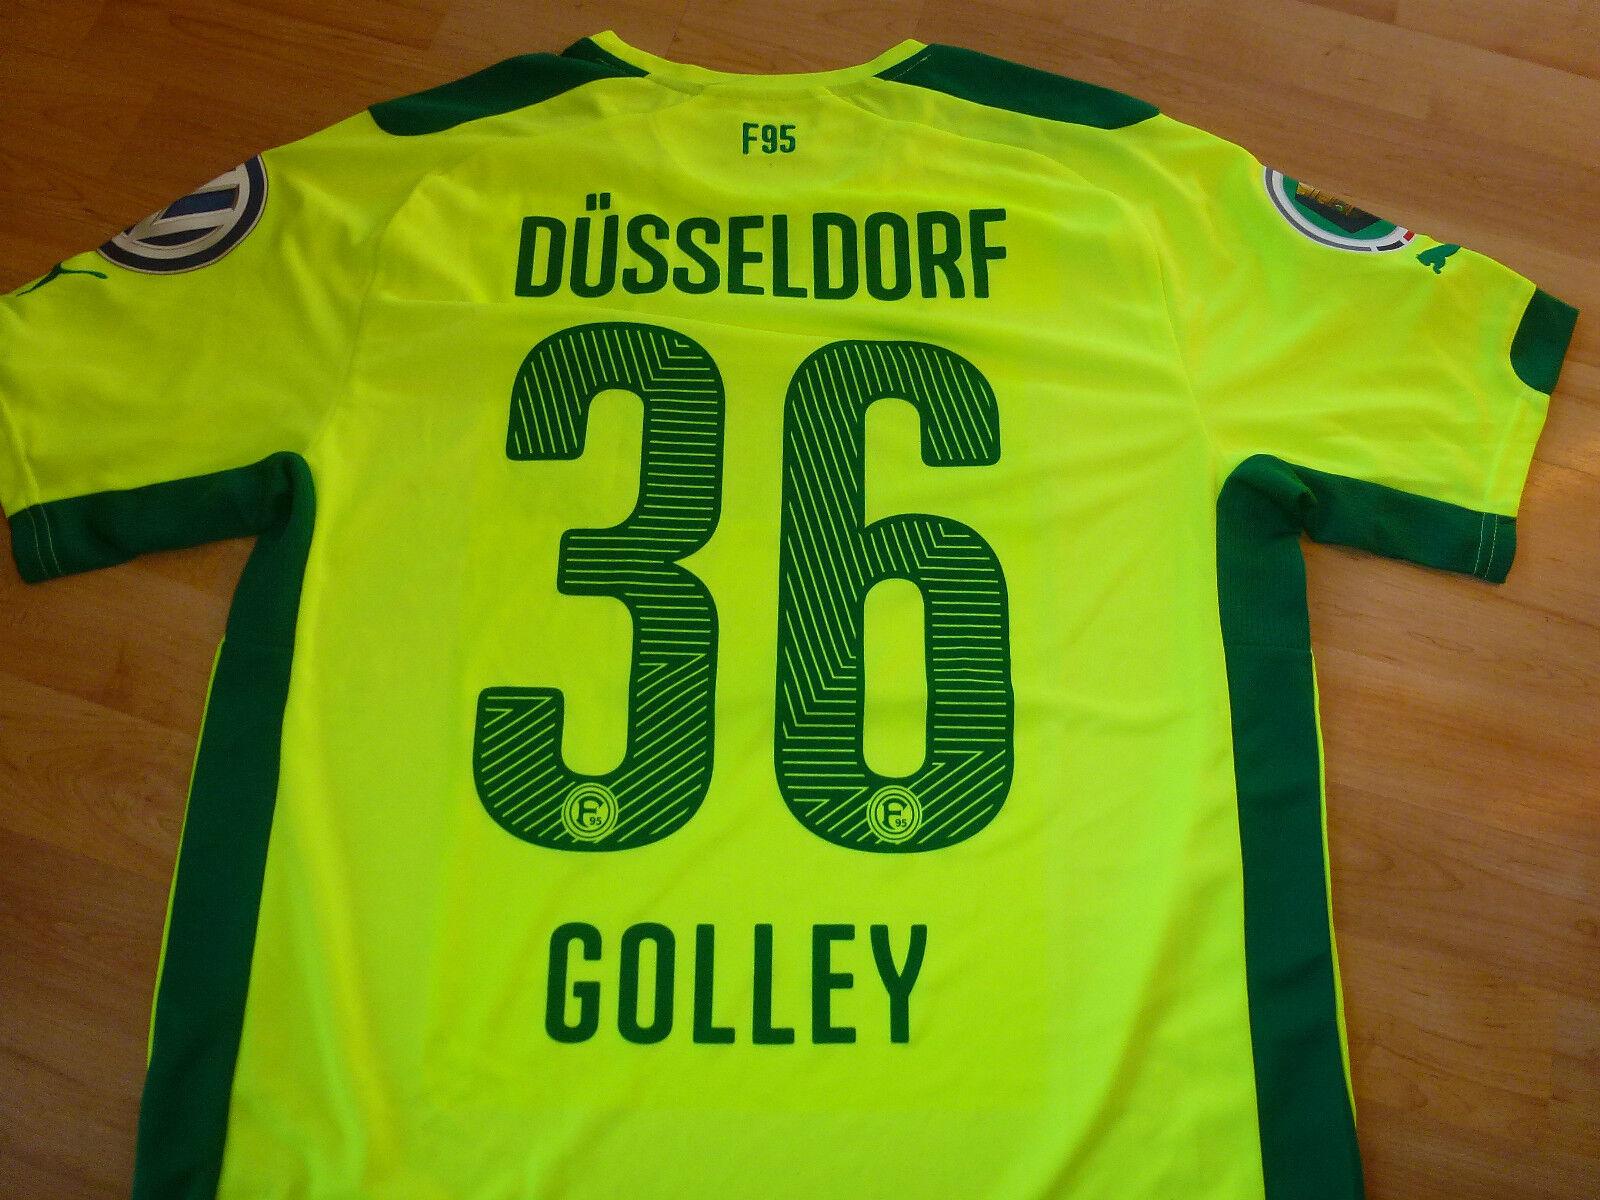 Fortuna Düsseldorf Pokal Trikot gelb  36 Golley 14 15  Match Preparot DFB Patch